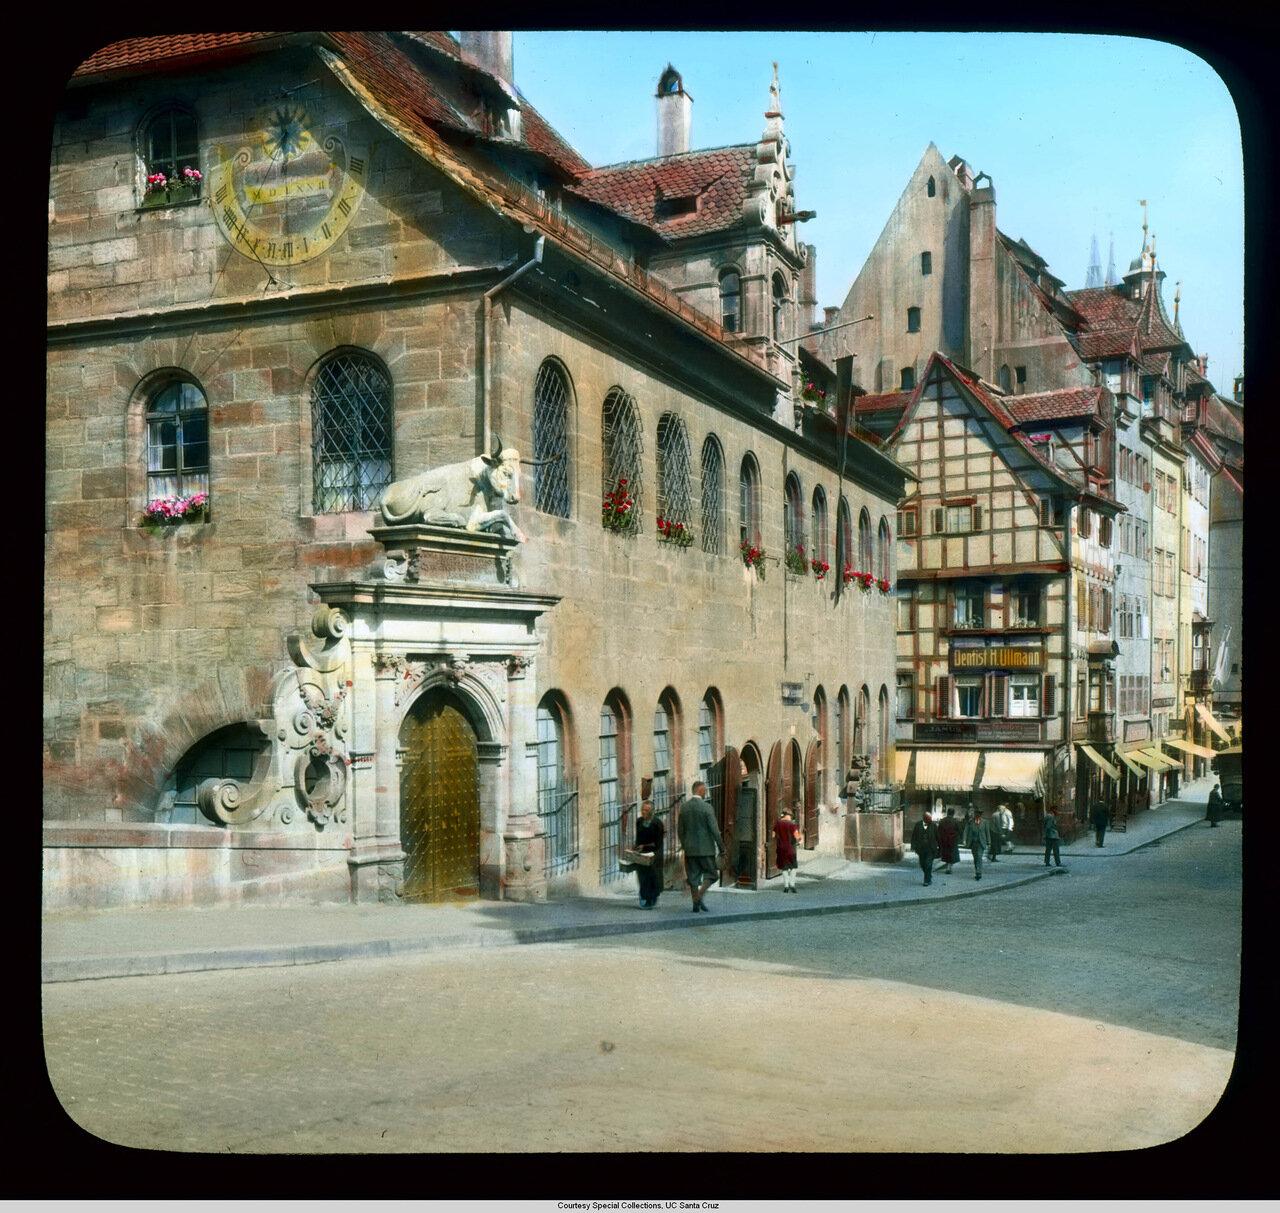 Нюренберг. Мясная лавка с воротами эпохи Ренессанса (1599)